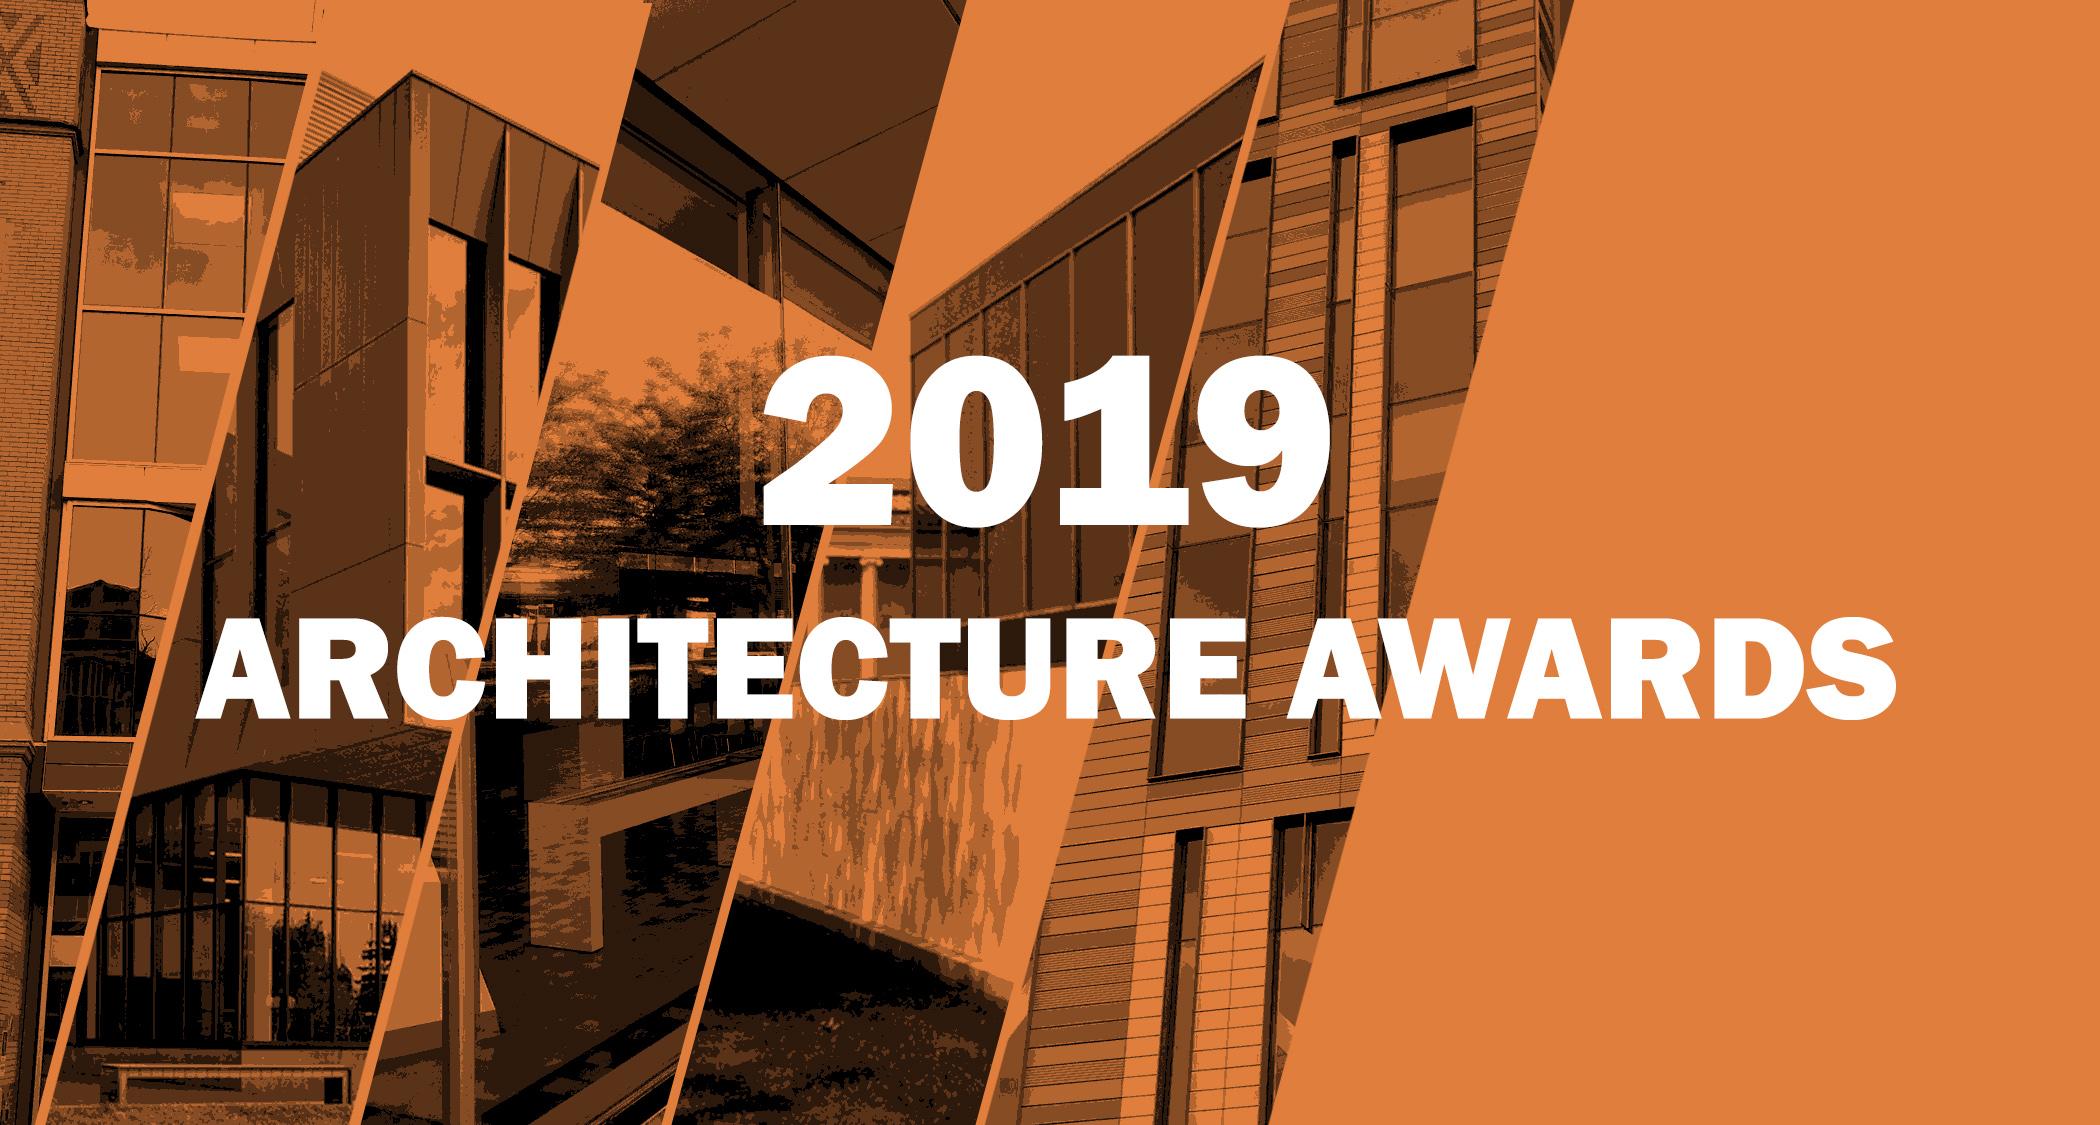 2019 Architecture Awards Banner copy.jpg